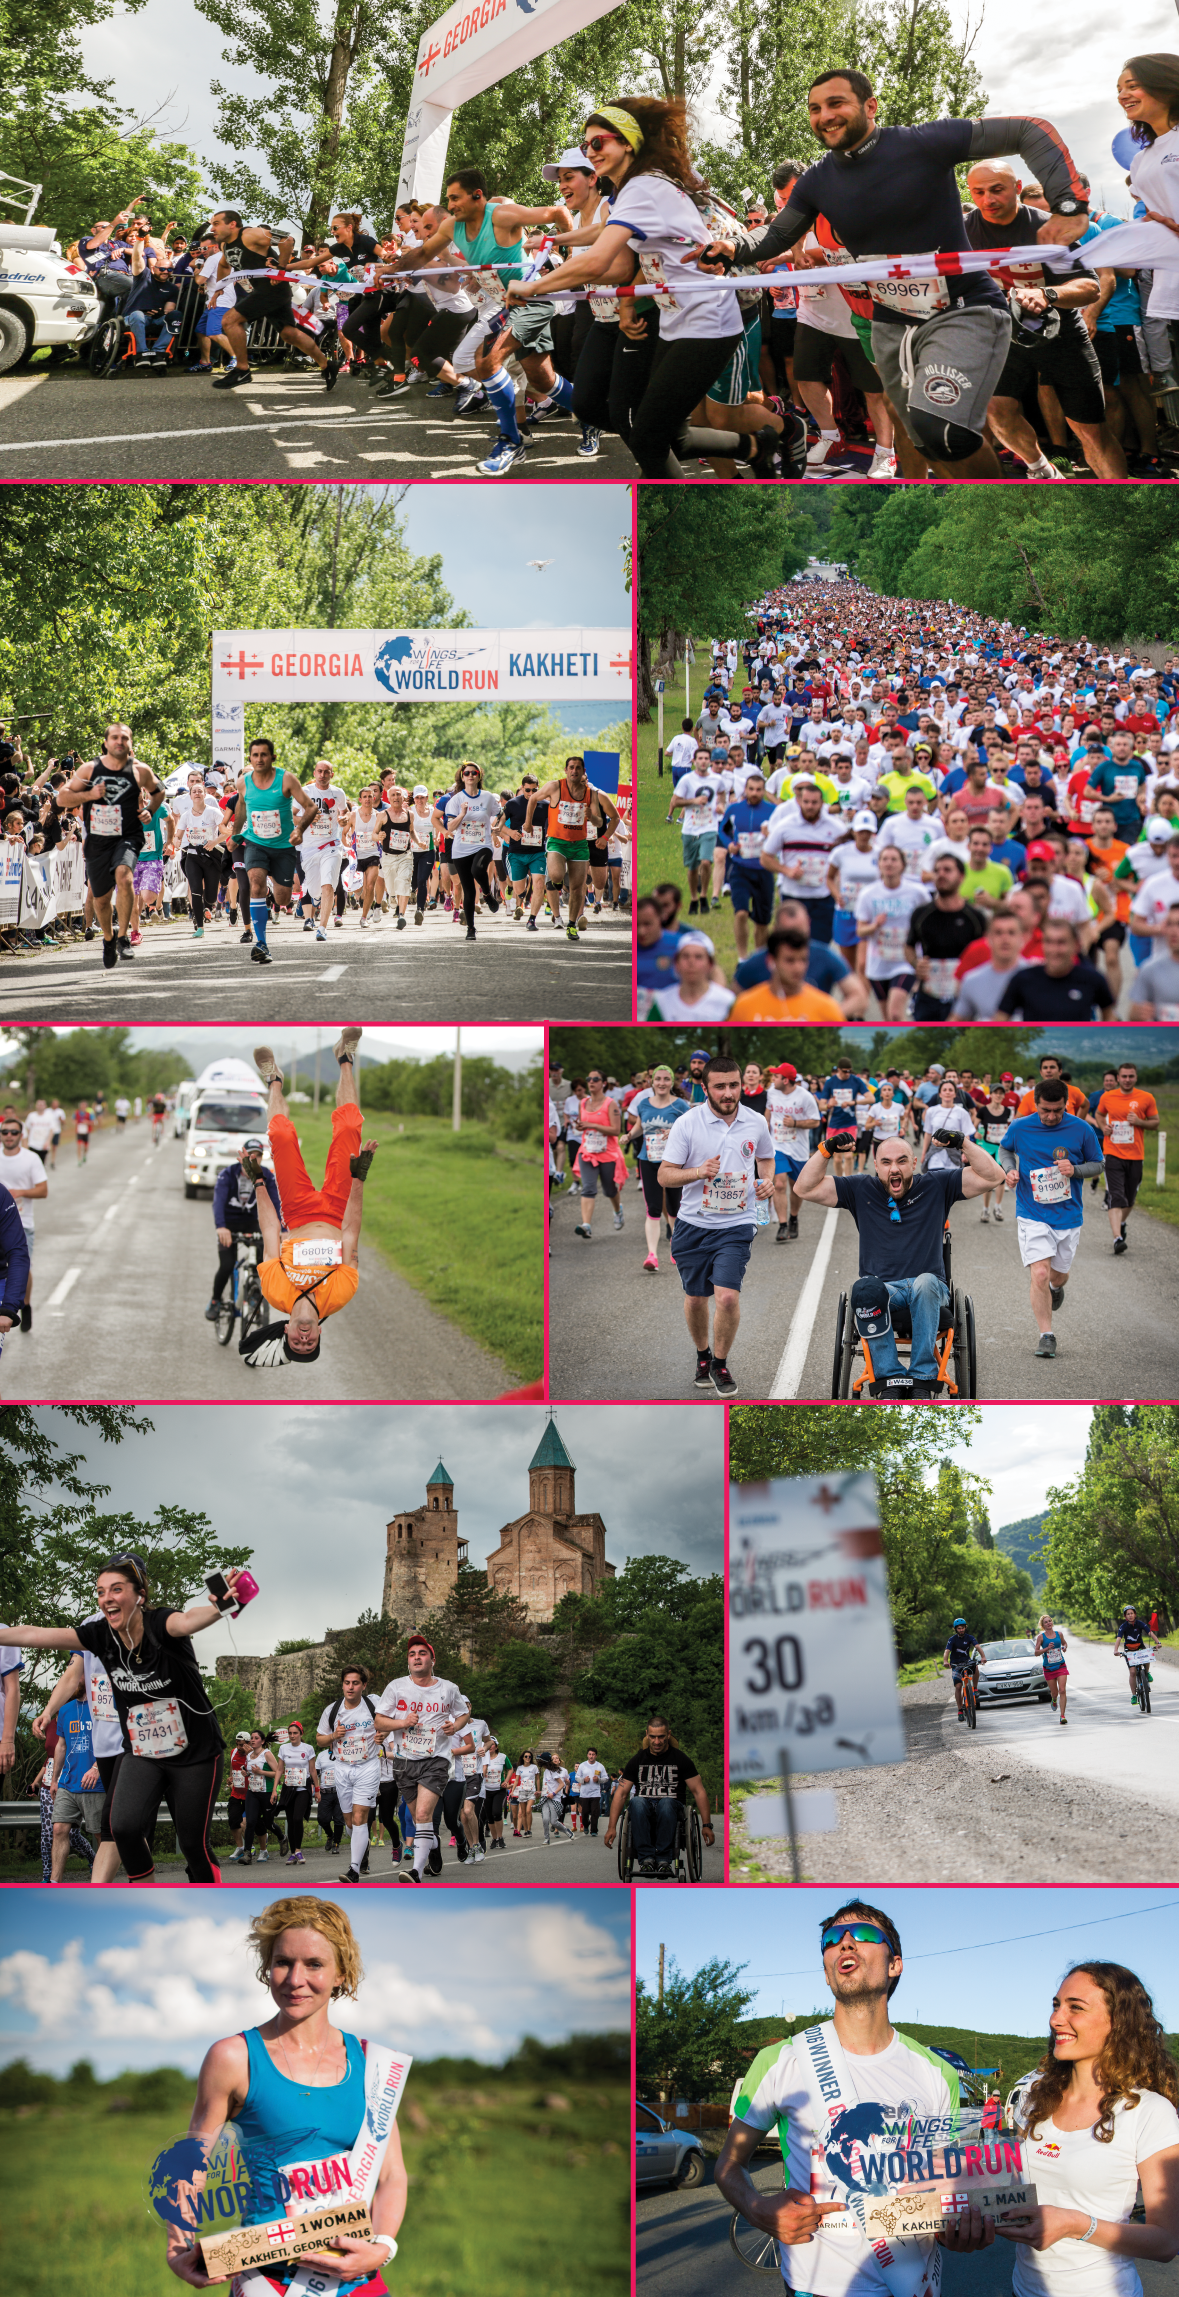 Wings For Life World Run 2016 და მისი გამარჯვებულები